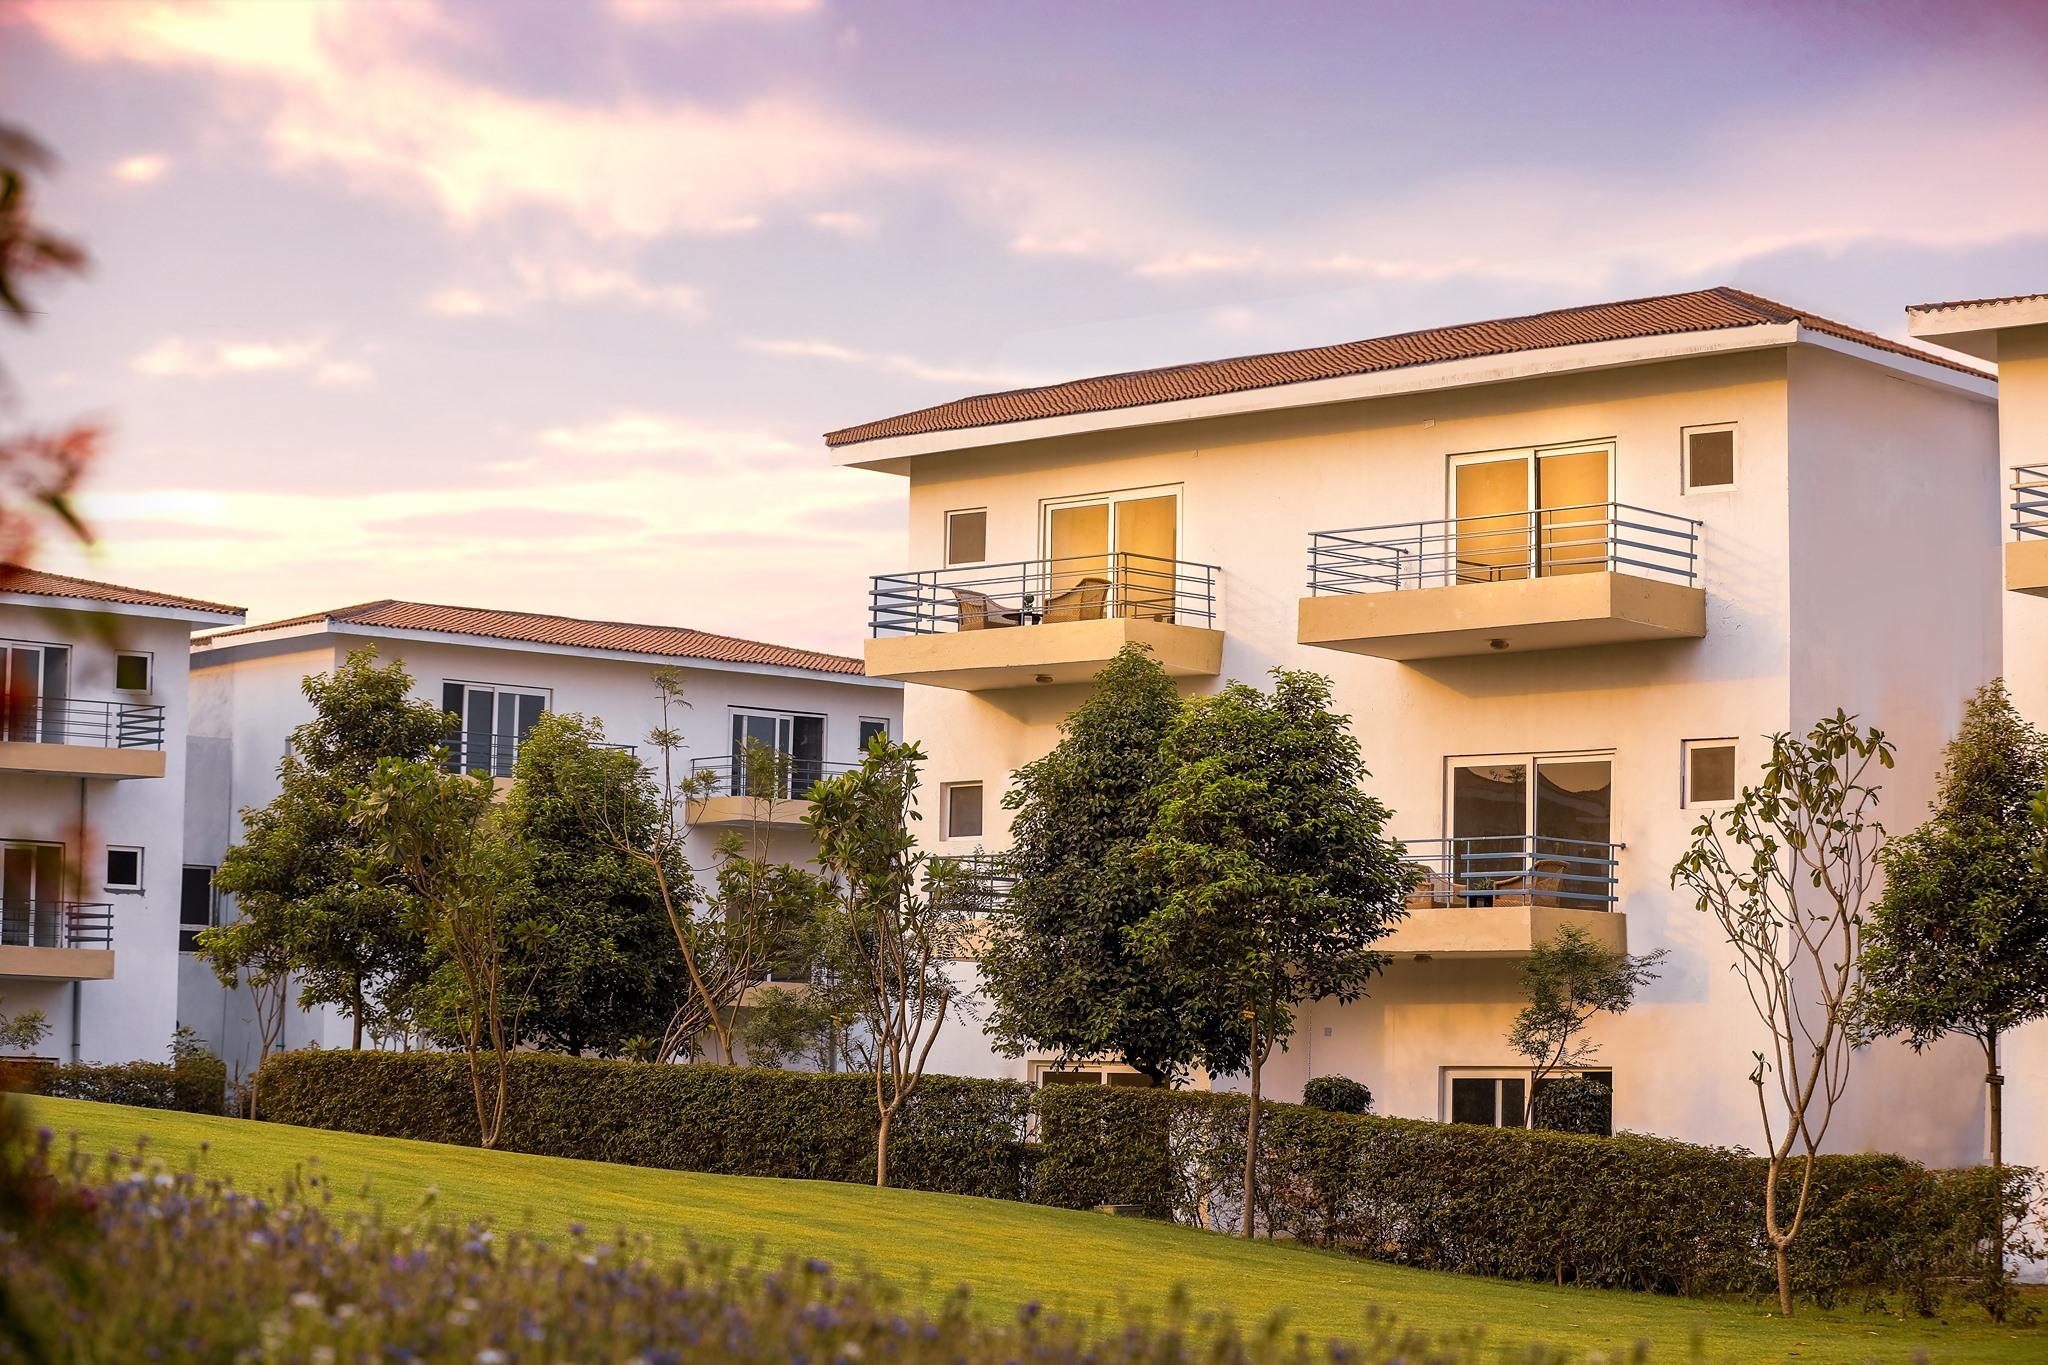 villas for sale in Greater Noida